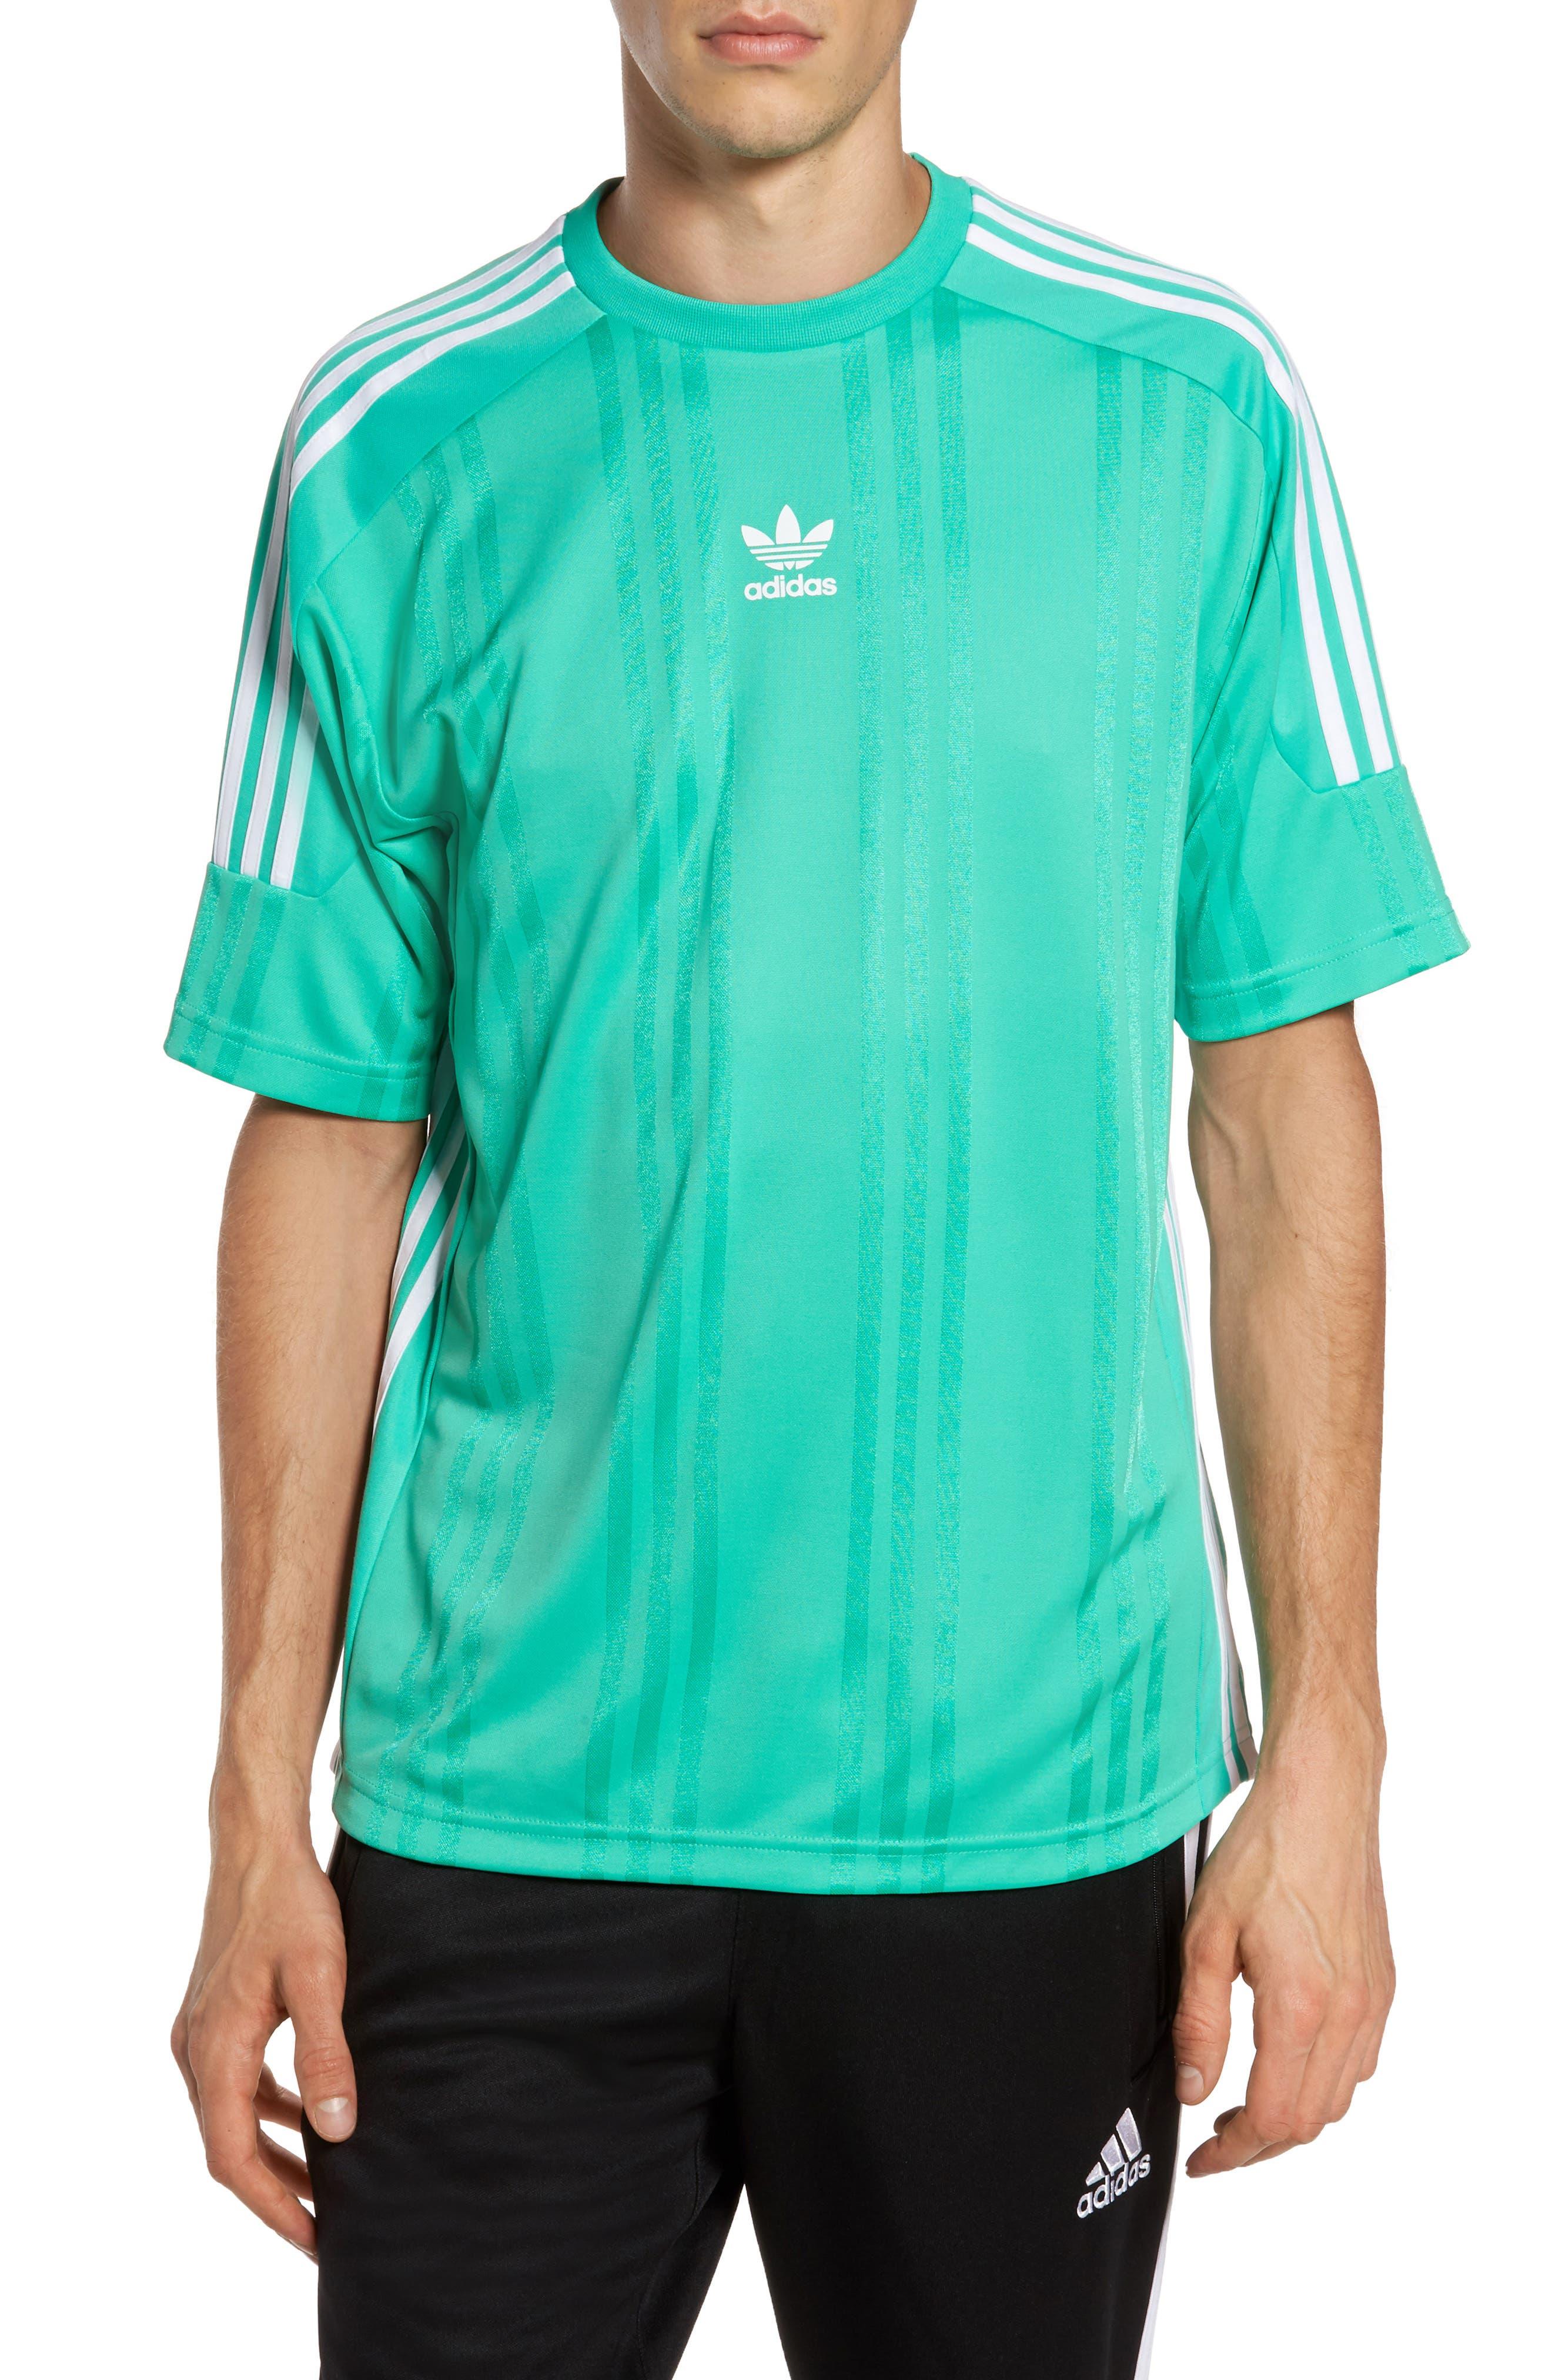 Alternate Image 1 Selected - adidas Originals Jacquard Stripe T-Shirt